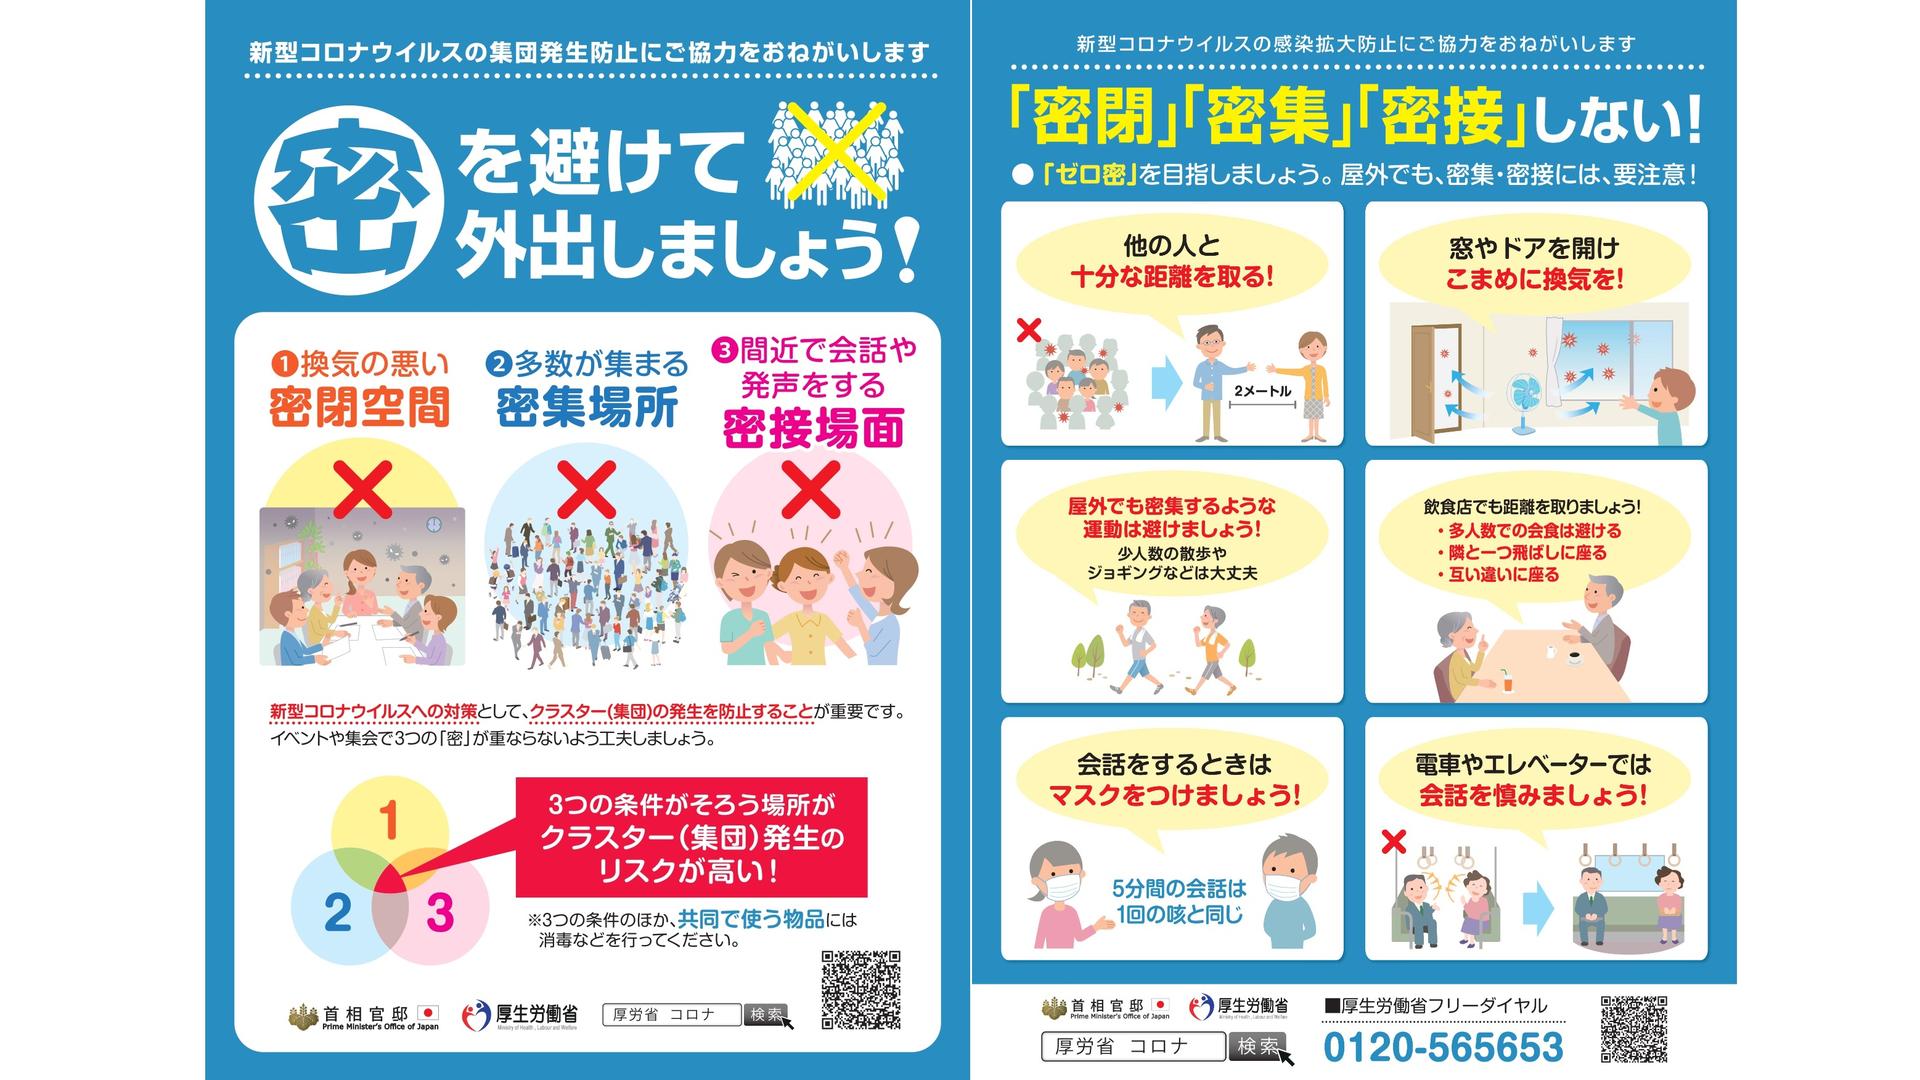 https://cdn-ak.f.st-hatena.com/images/fotolife/o/officenagasawa/20200418/20200418174432.jpg